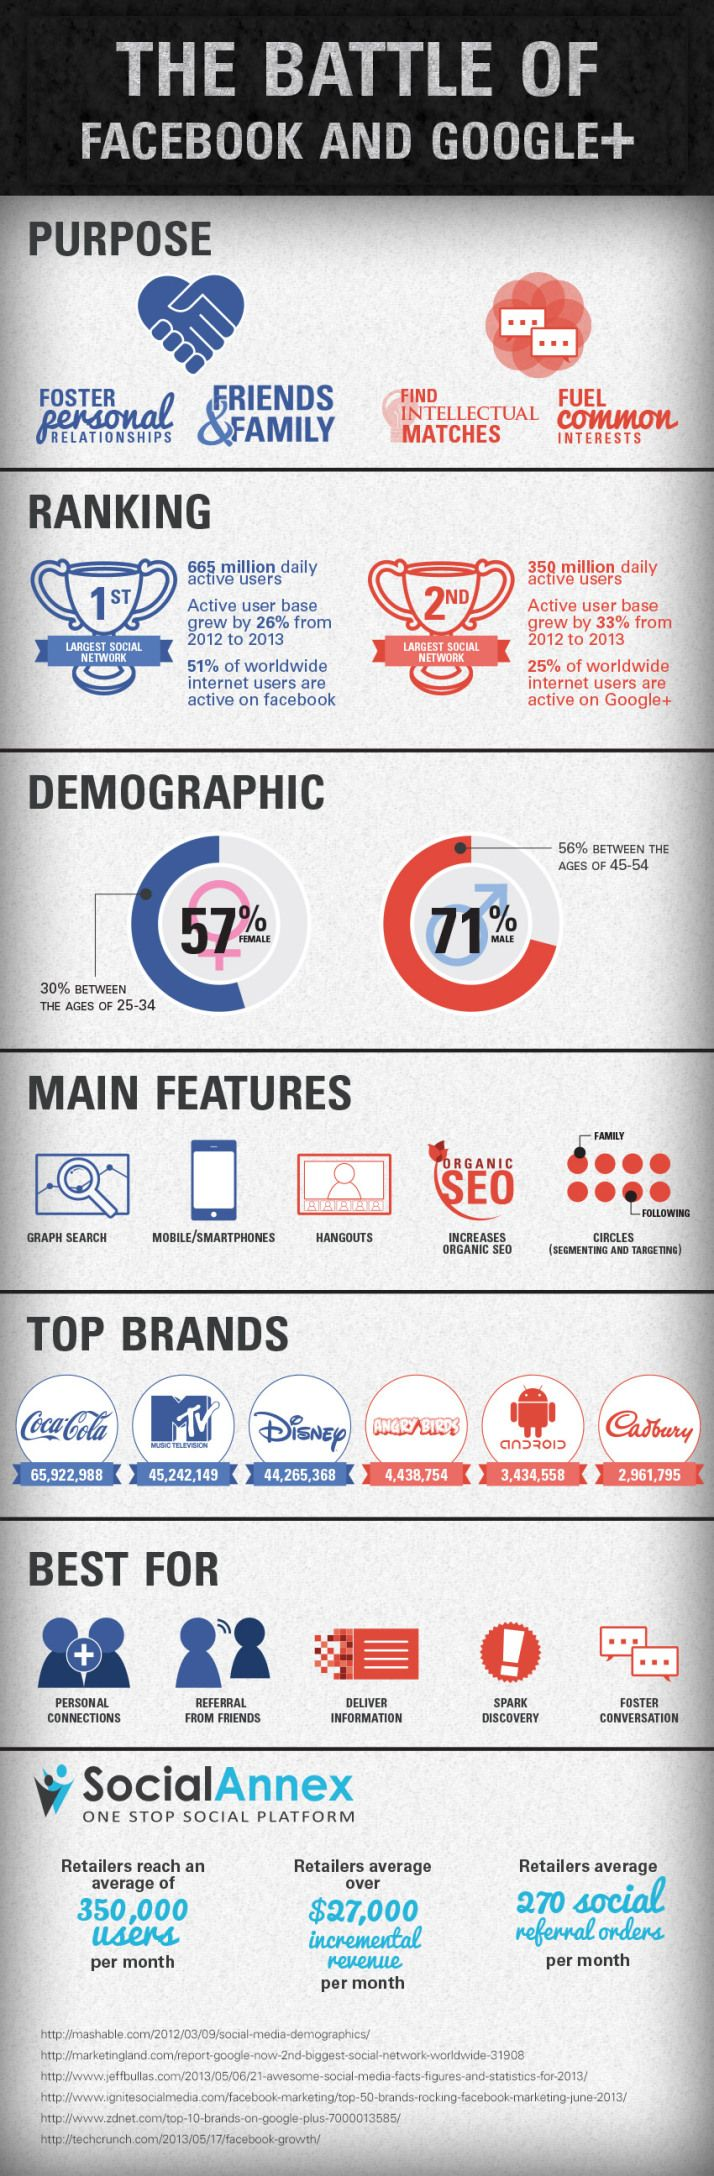 The battle of FaceBook and Google + #infografia #infographic #socialmedia